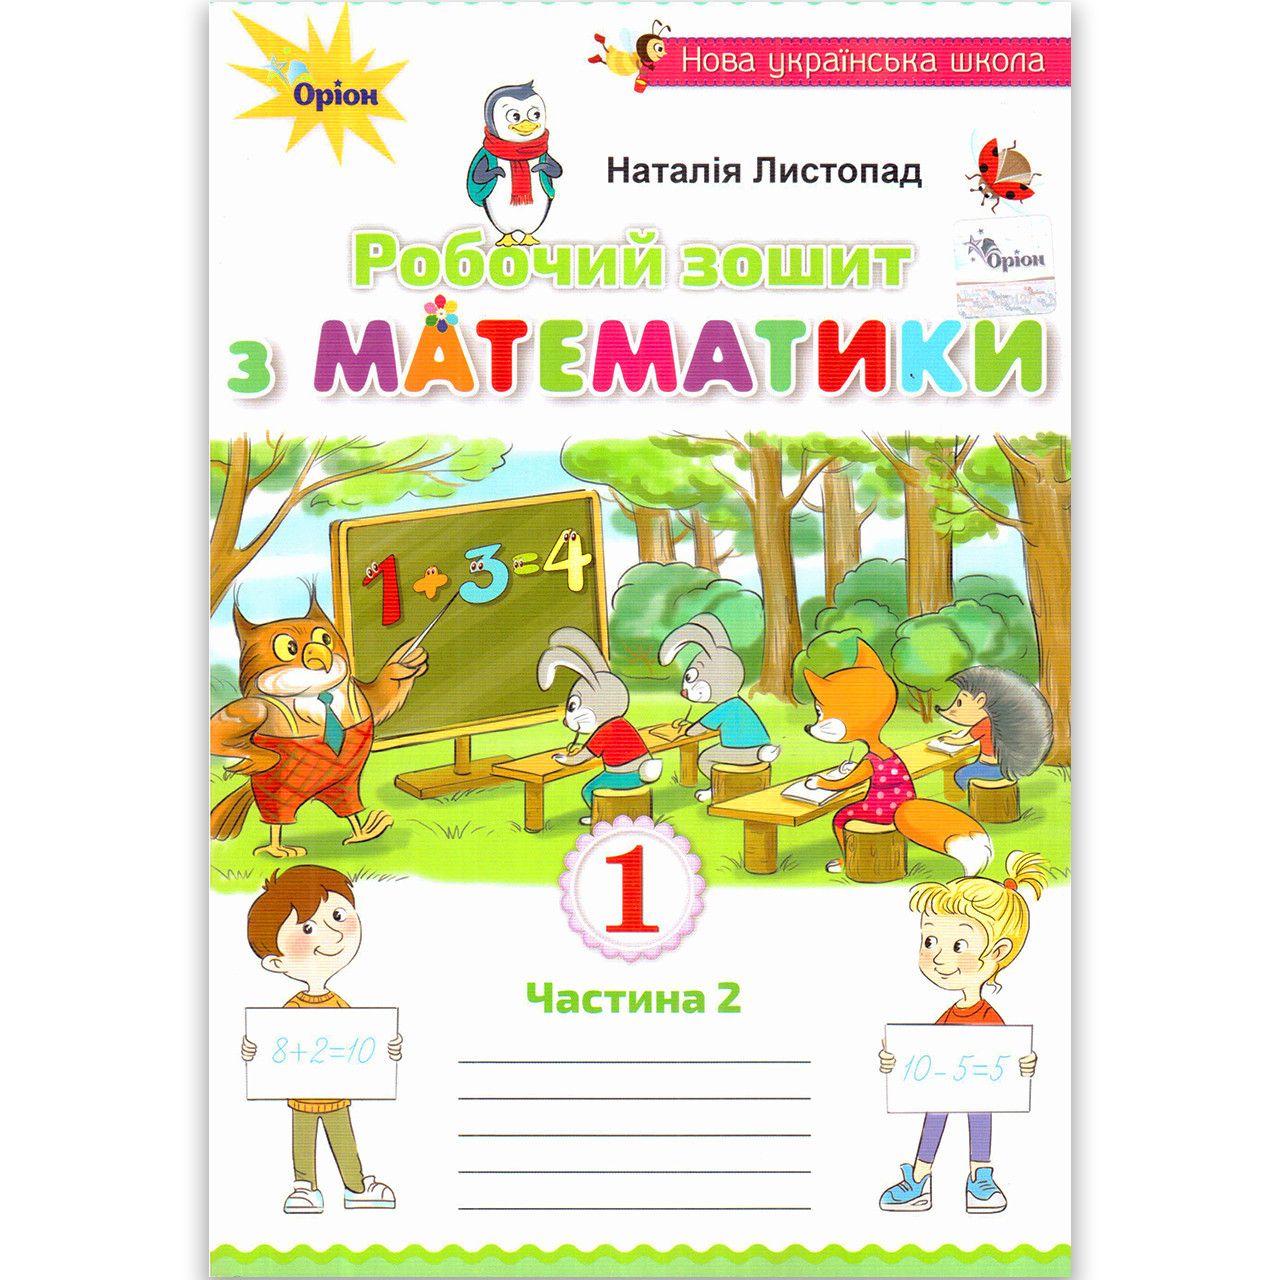 Зошит Математика 1 клас Частина 2 Авт: Листопад Н. Вид: Оріон